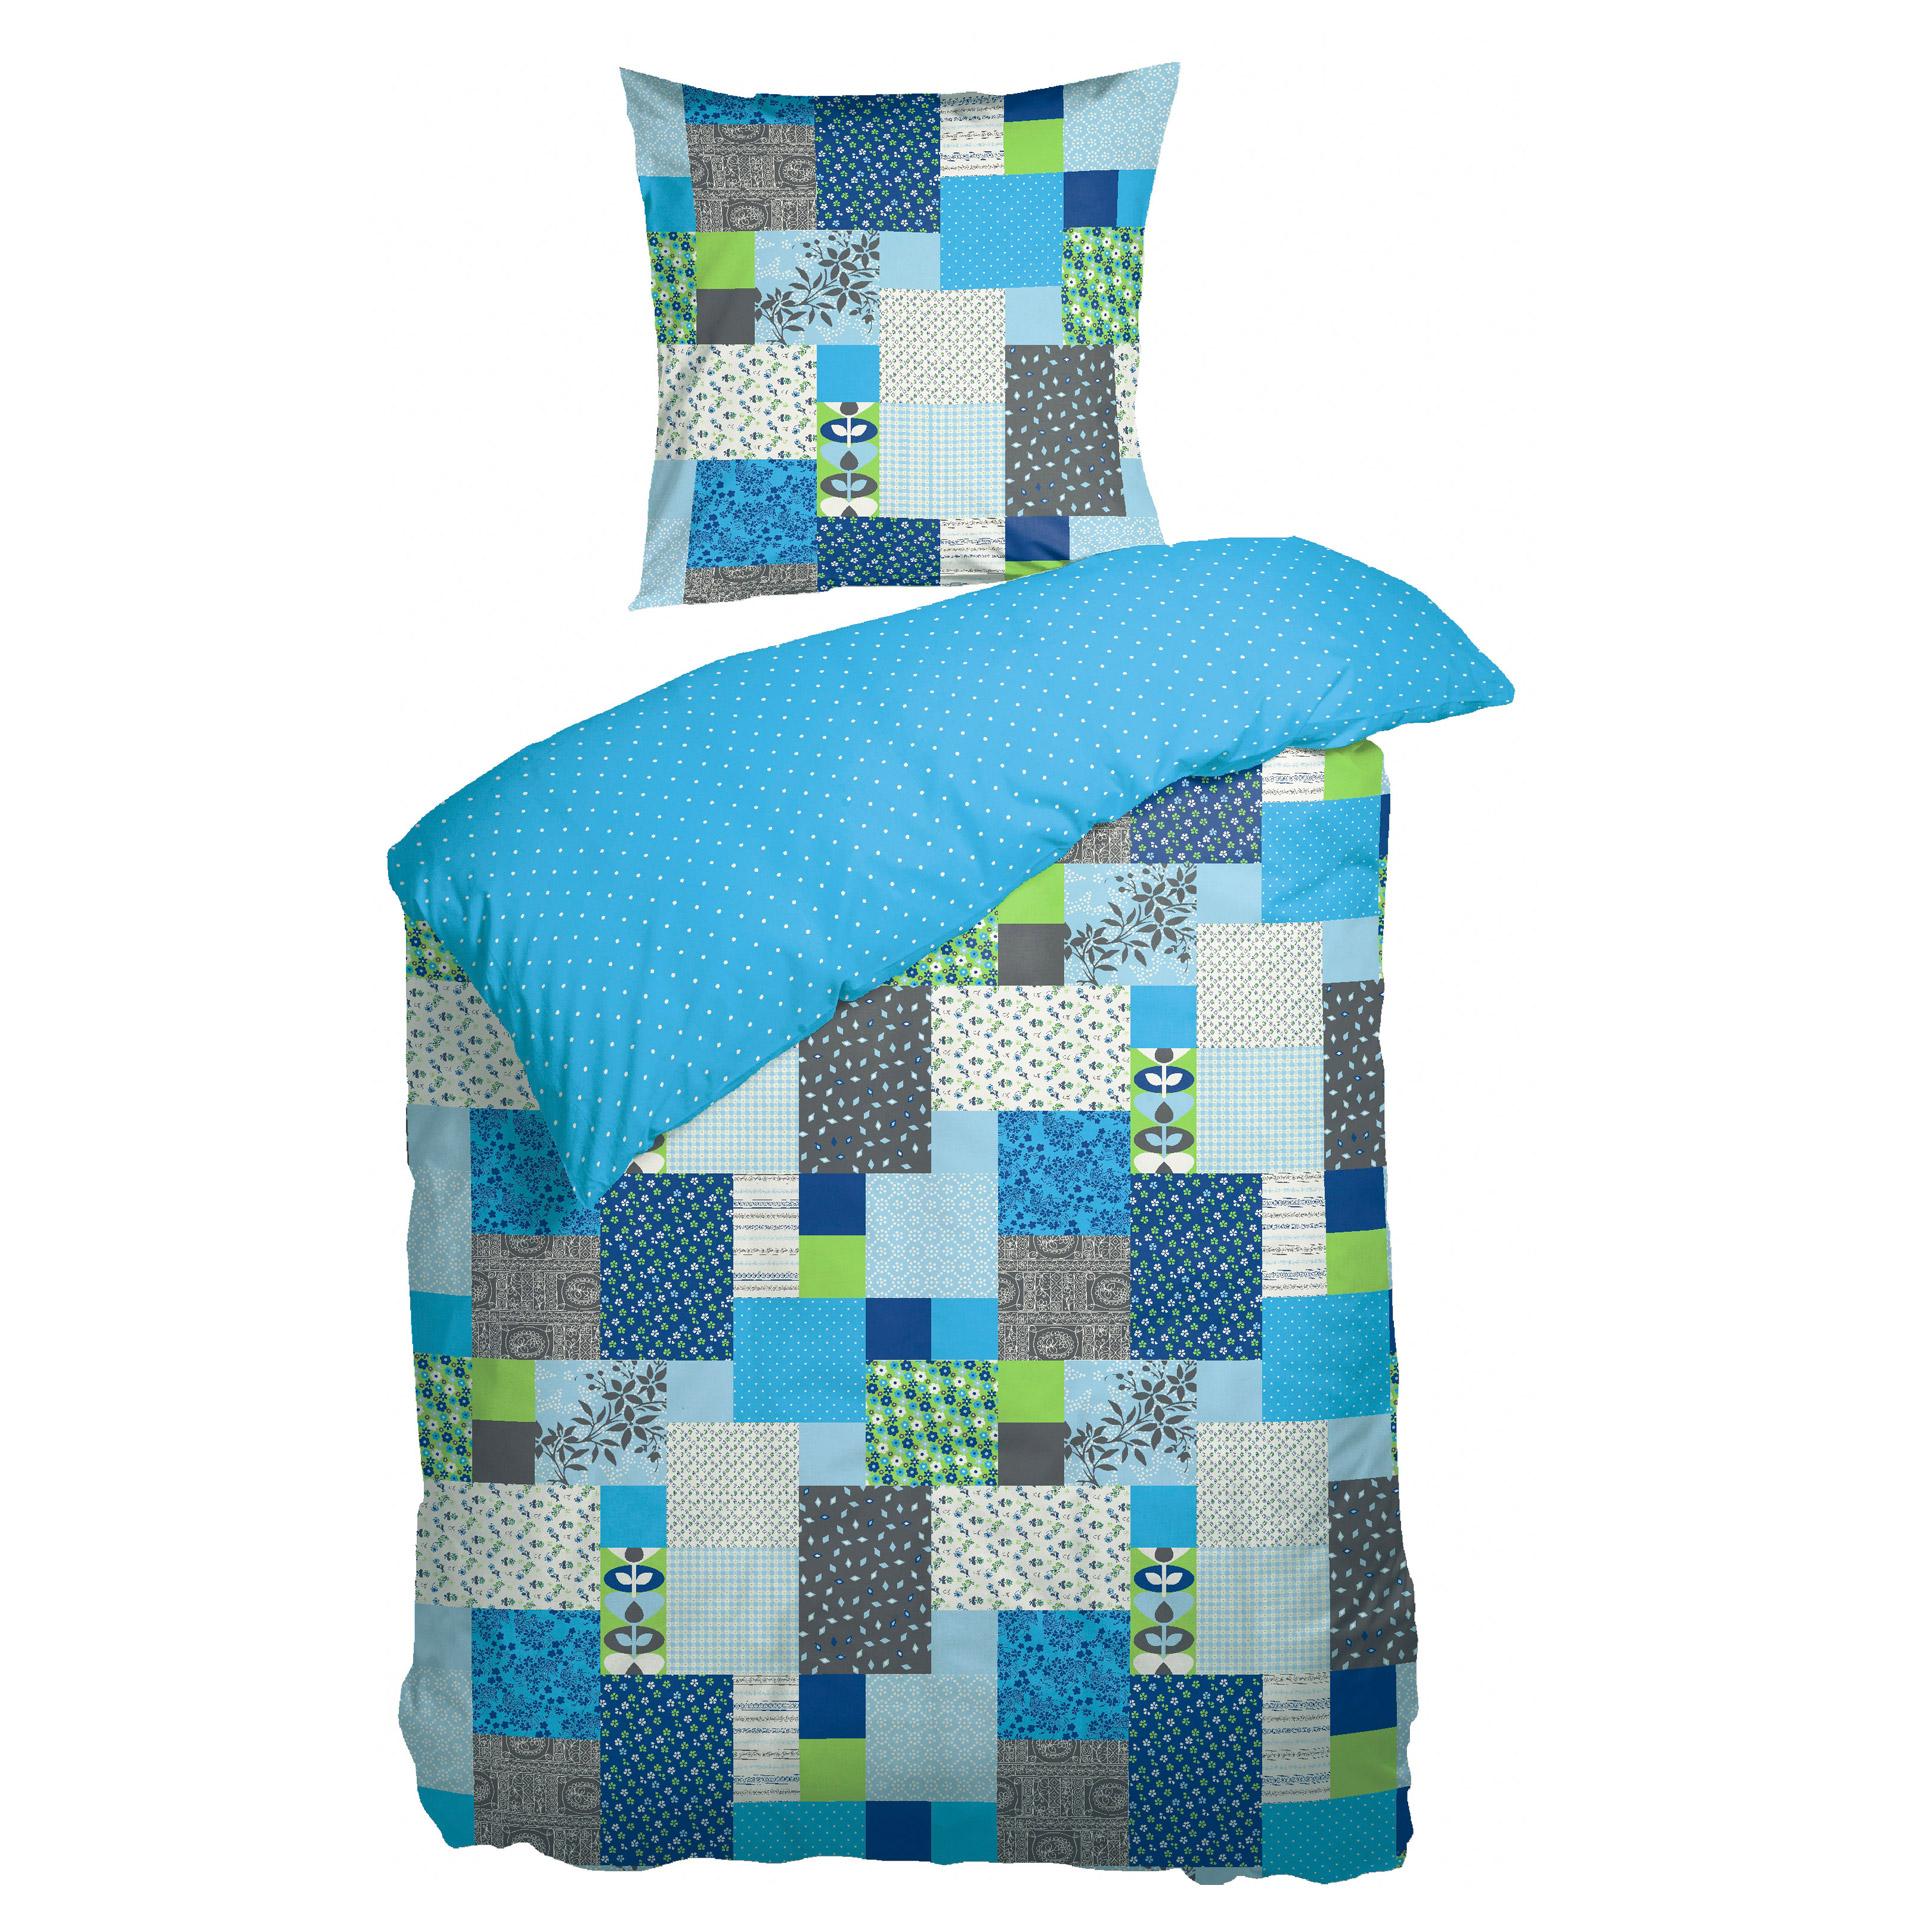 Renforcé-Bettwäsche Hedda (155x220, grau-blau)